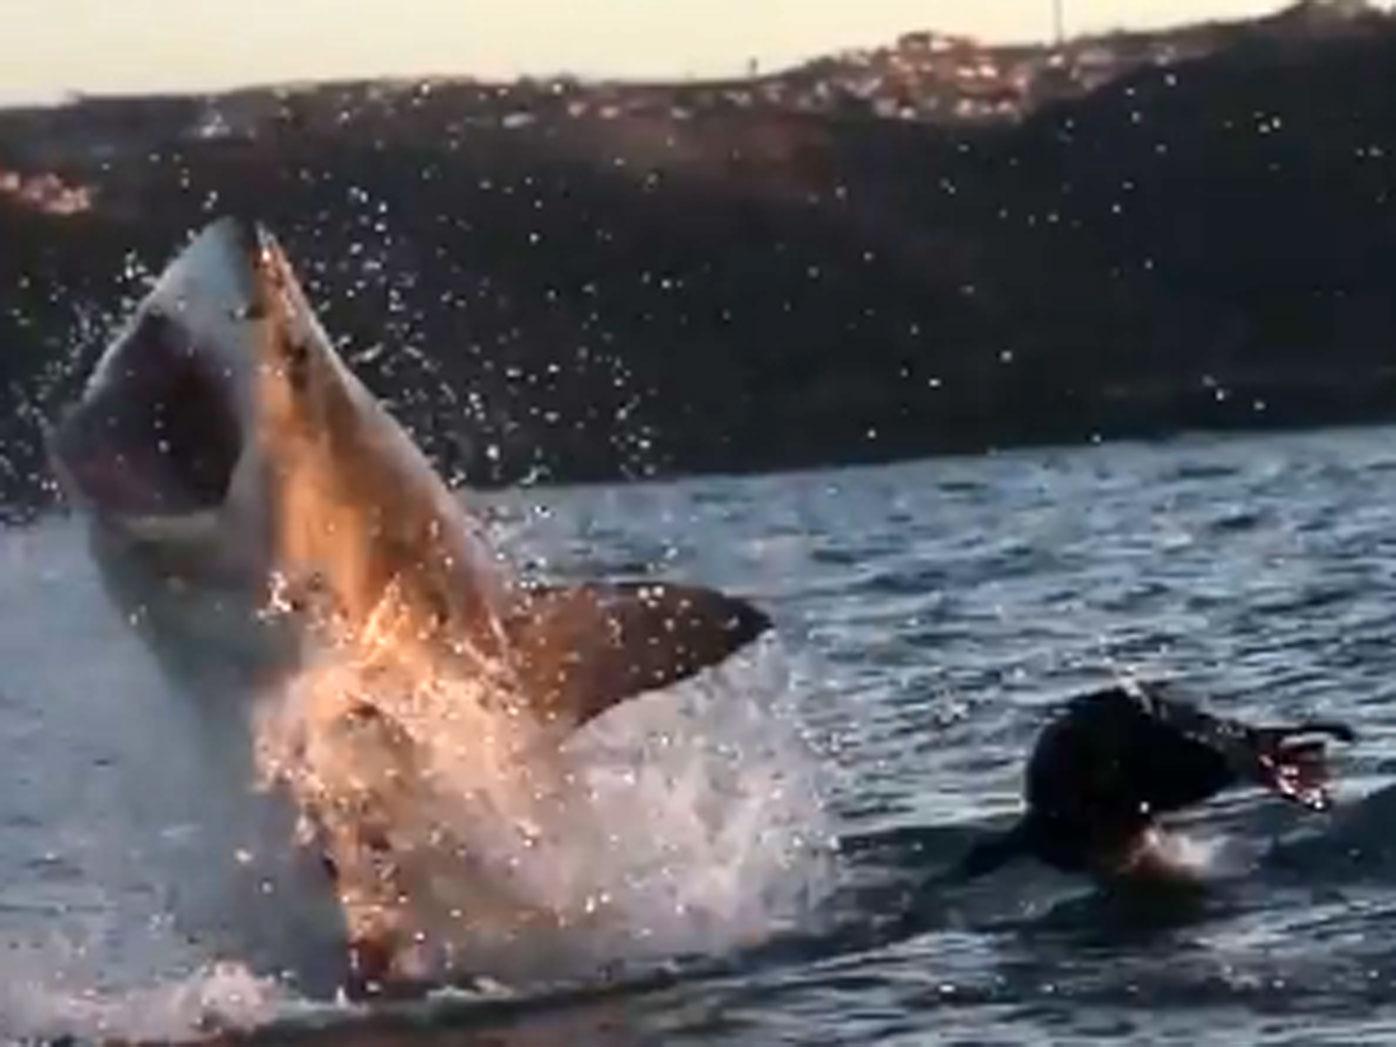 Shark Attacks In Australia: How Prevention Technology Can